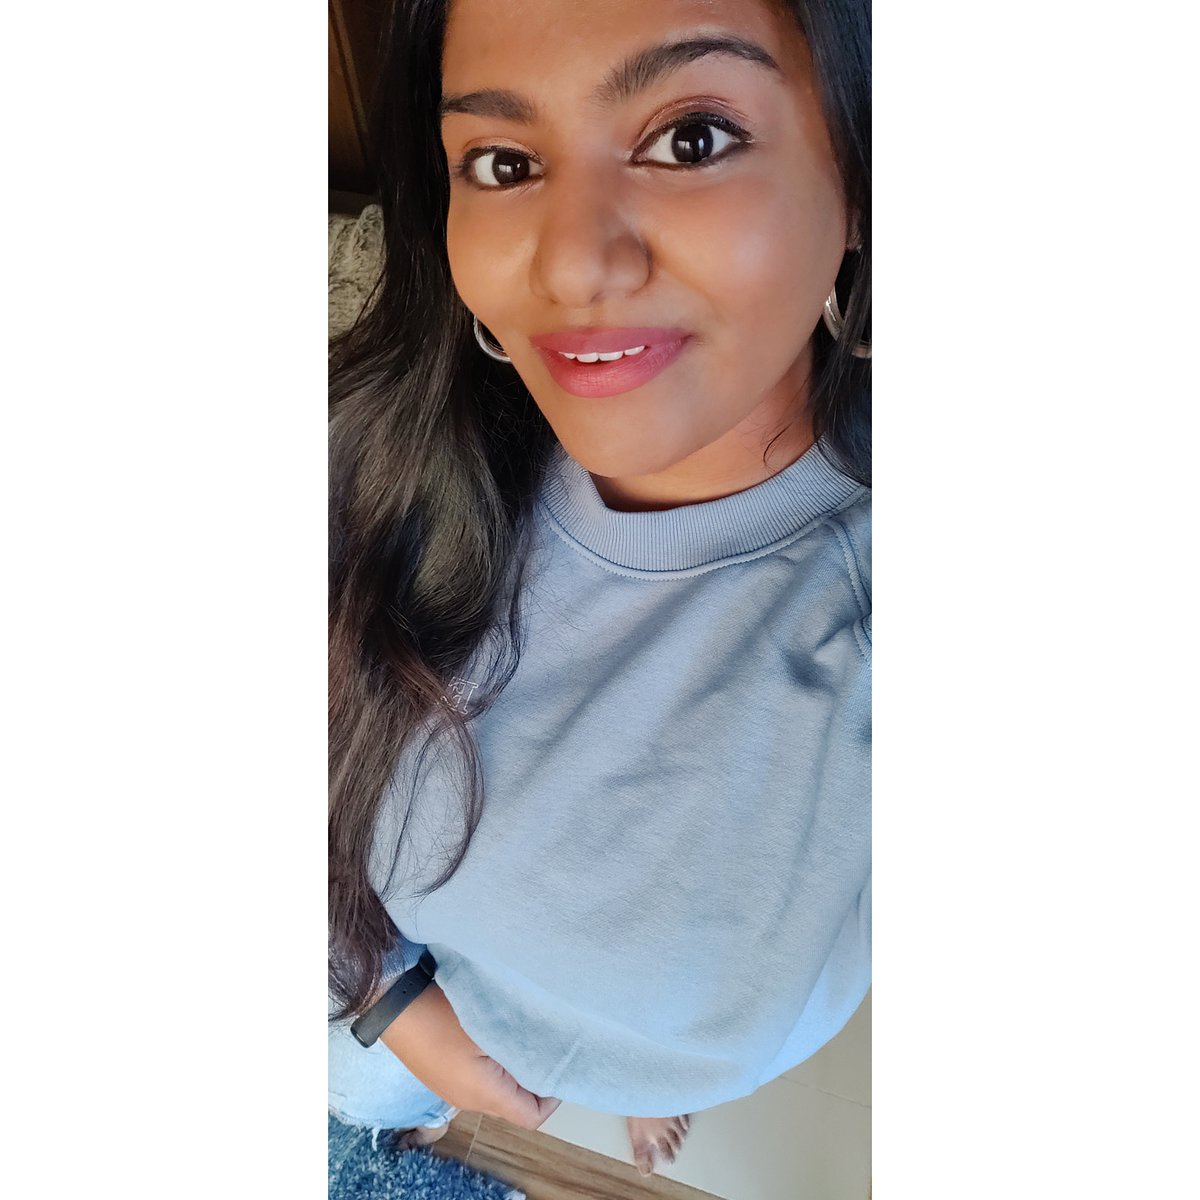 Bloom 🌼 With Grace. 😌  #smile #live #positivity #postoftheday #picoftheday #theoneindiangirlheer #happiness #grace #desi #girl #newpost #newyoutuber #blogger #beautiful #beauty #selflove #selfcare #happymood  #bestotheday #hair #fashion #girls